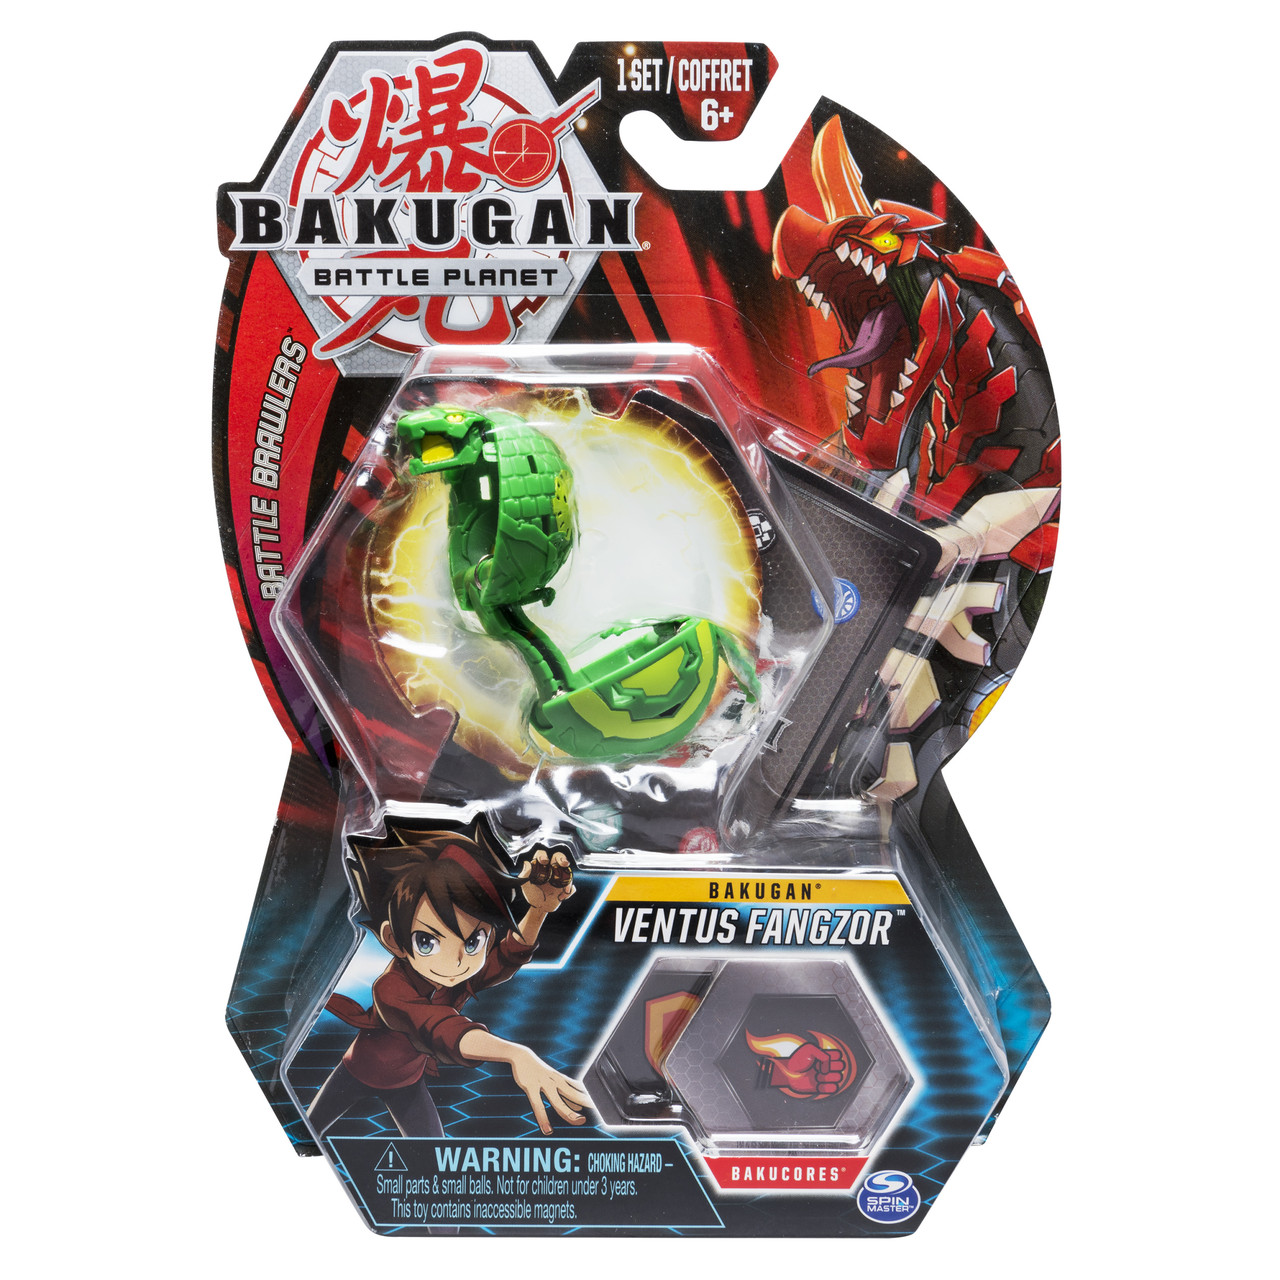 Бакуган Вентус Фангзор Bakugan Battle planet Ventus Fangzor Spin Master оригінал